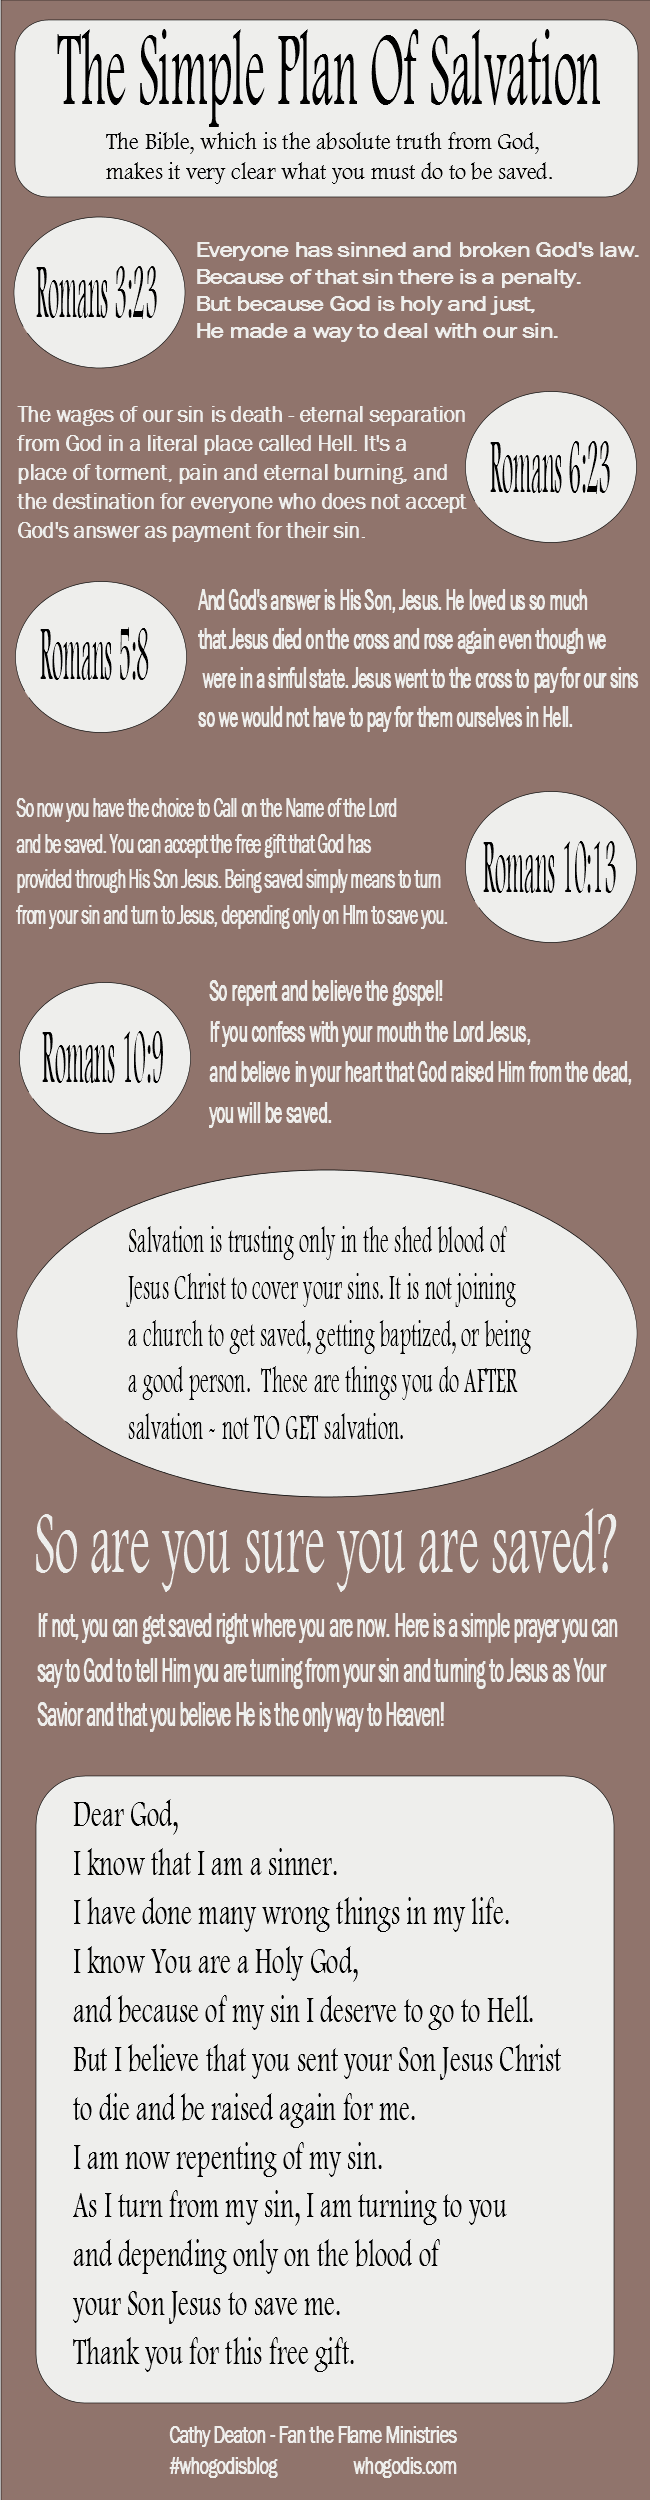 simple-plan-of-salvation